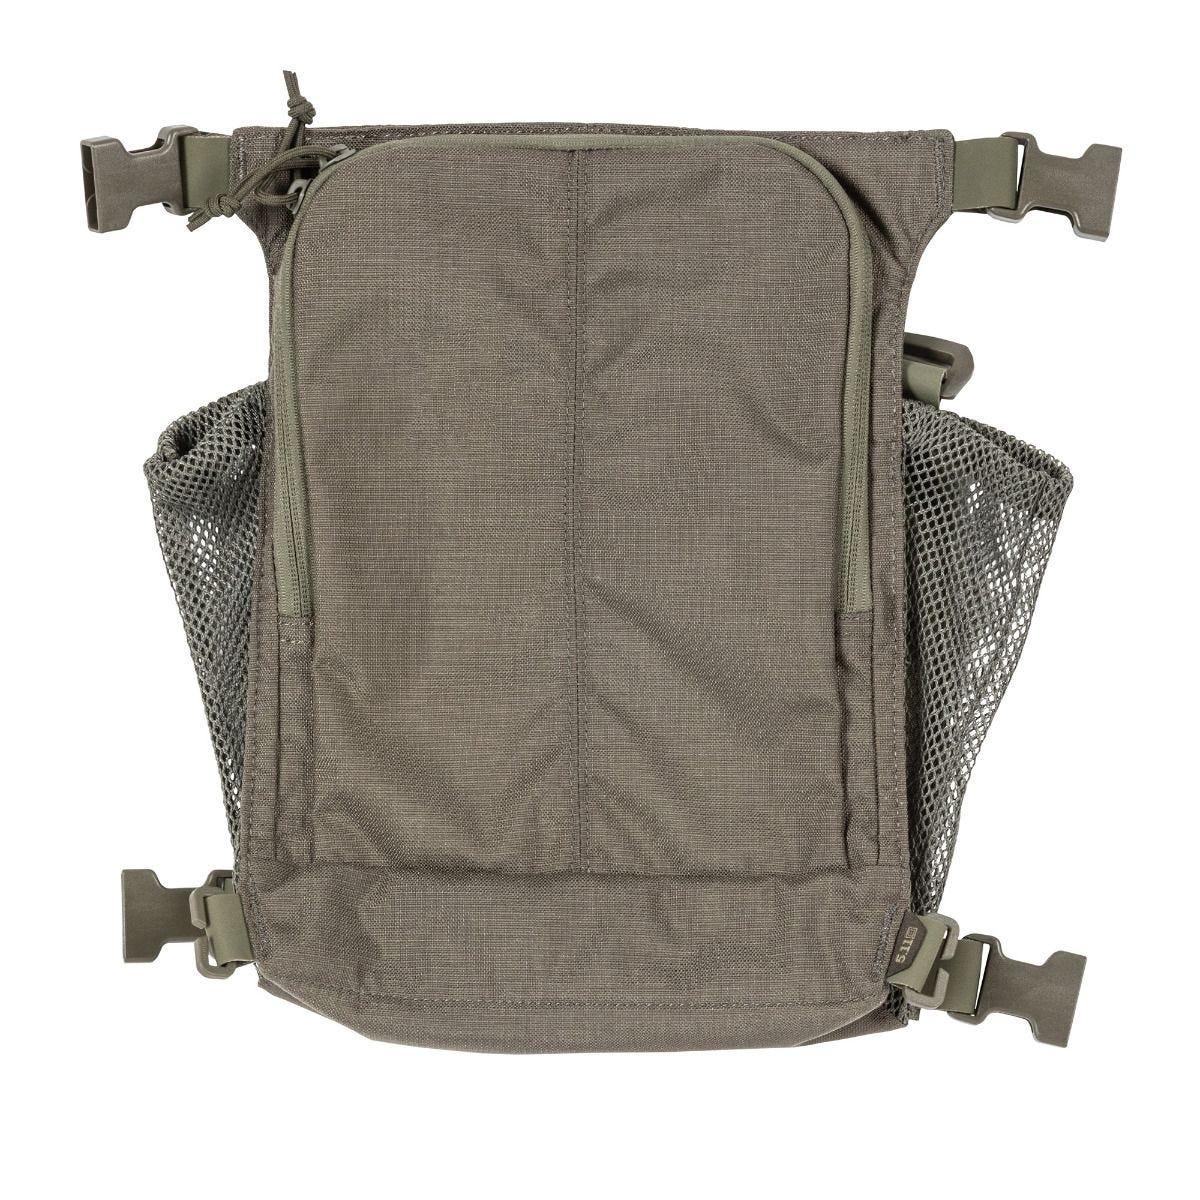 HELMET/SHOVE-IT GEAR SET -Ranger Green